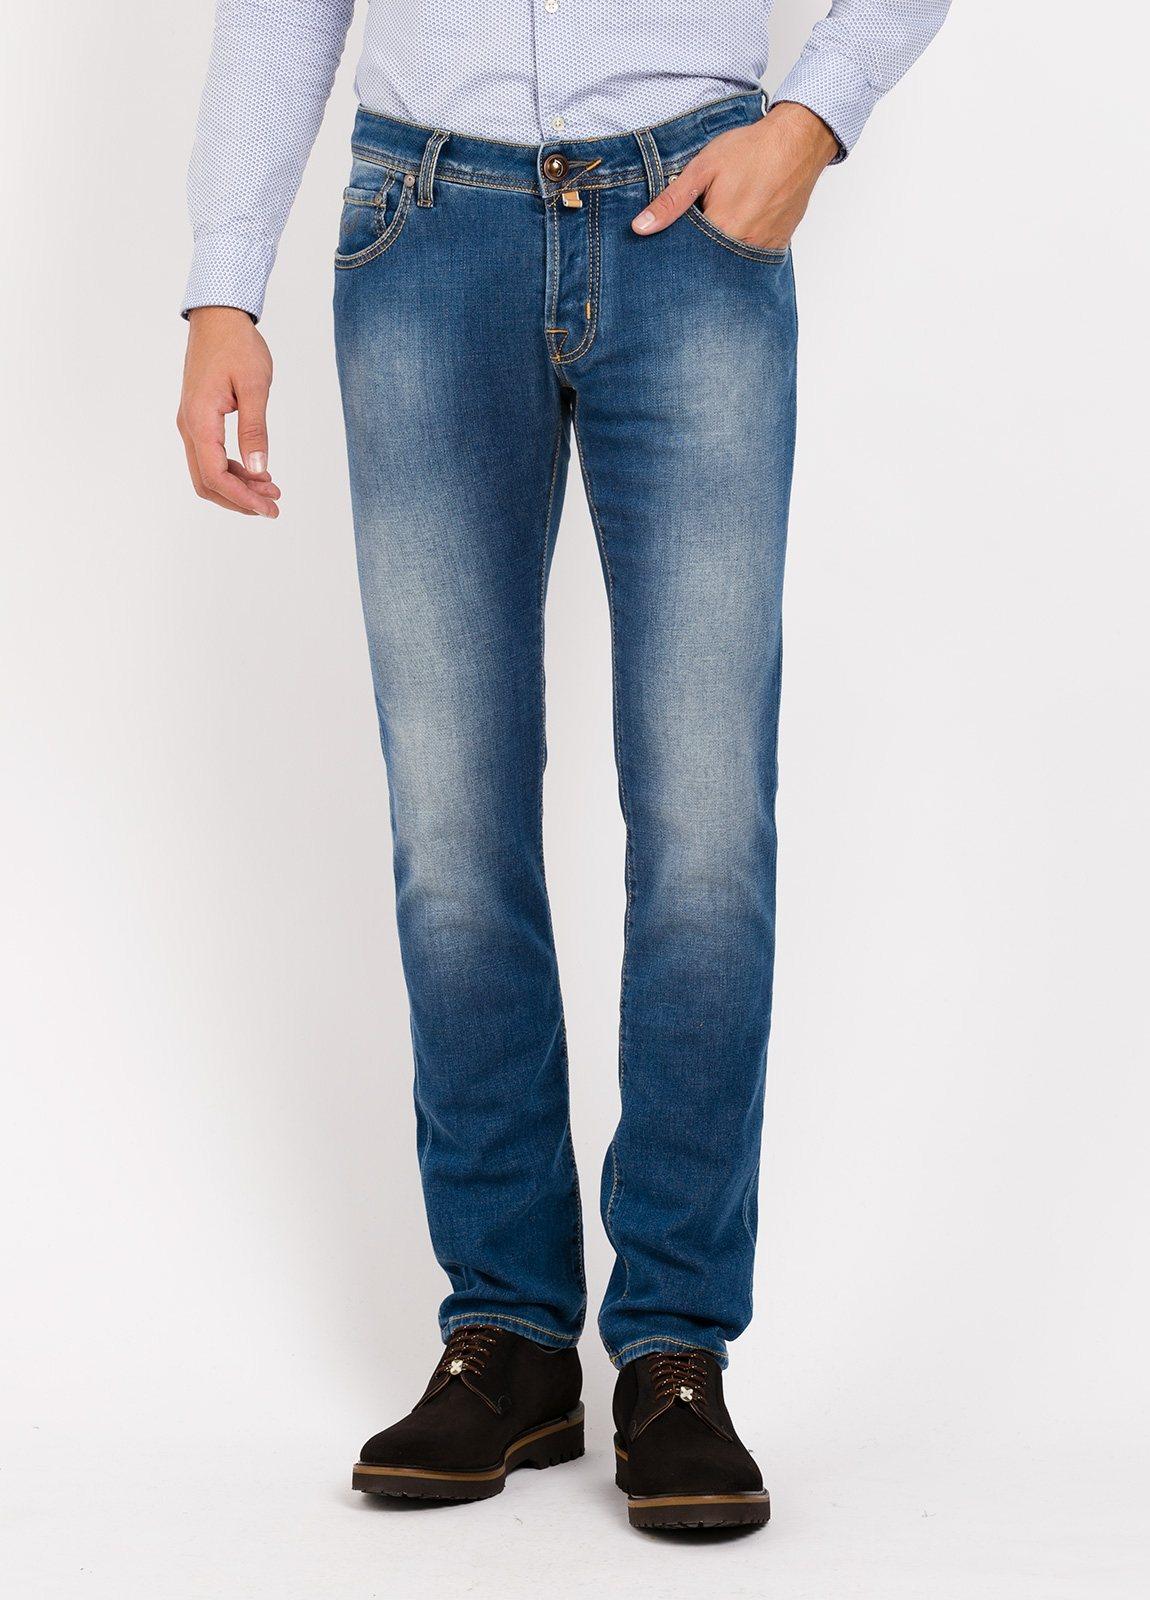 Pantalón 5 bolsillos ligeramente slim fit modelo J622 color azul denim . 95% Algodón, 3% poliestes 2% Ea.